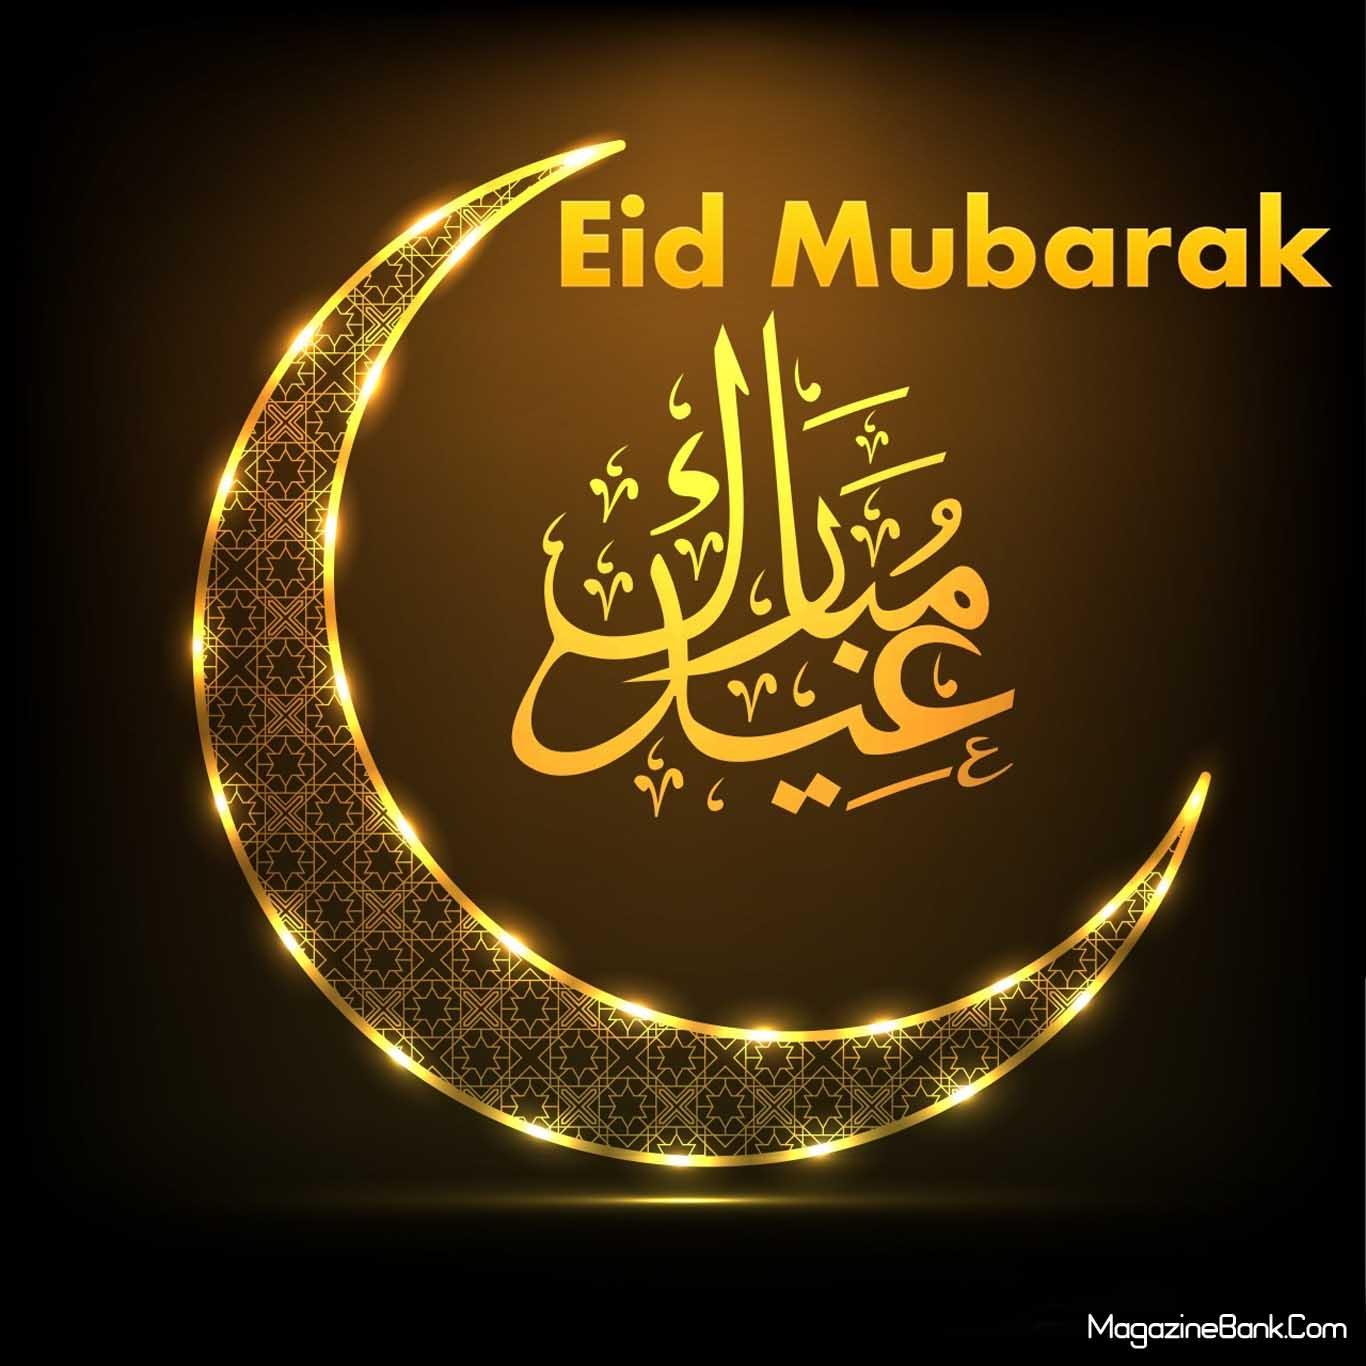 Eid Mubarak Hd Wallpapers Wallpaper Cave